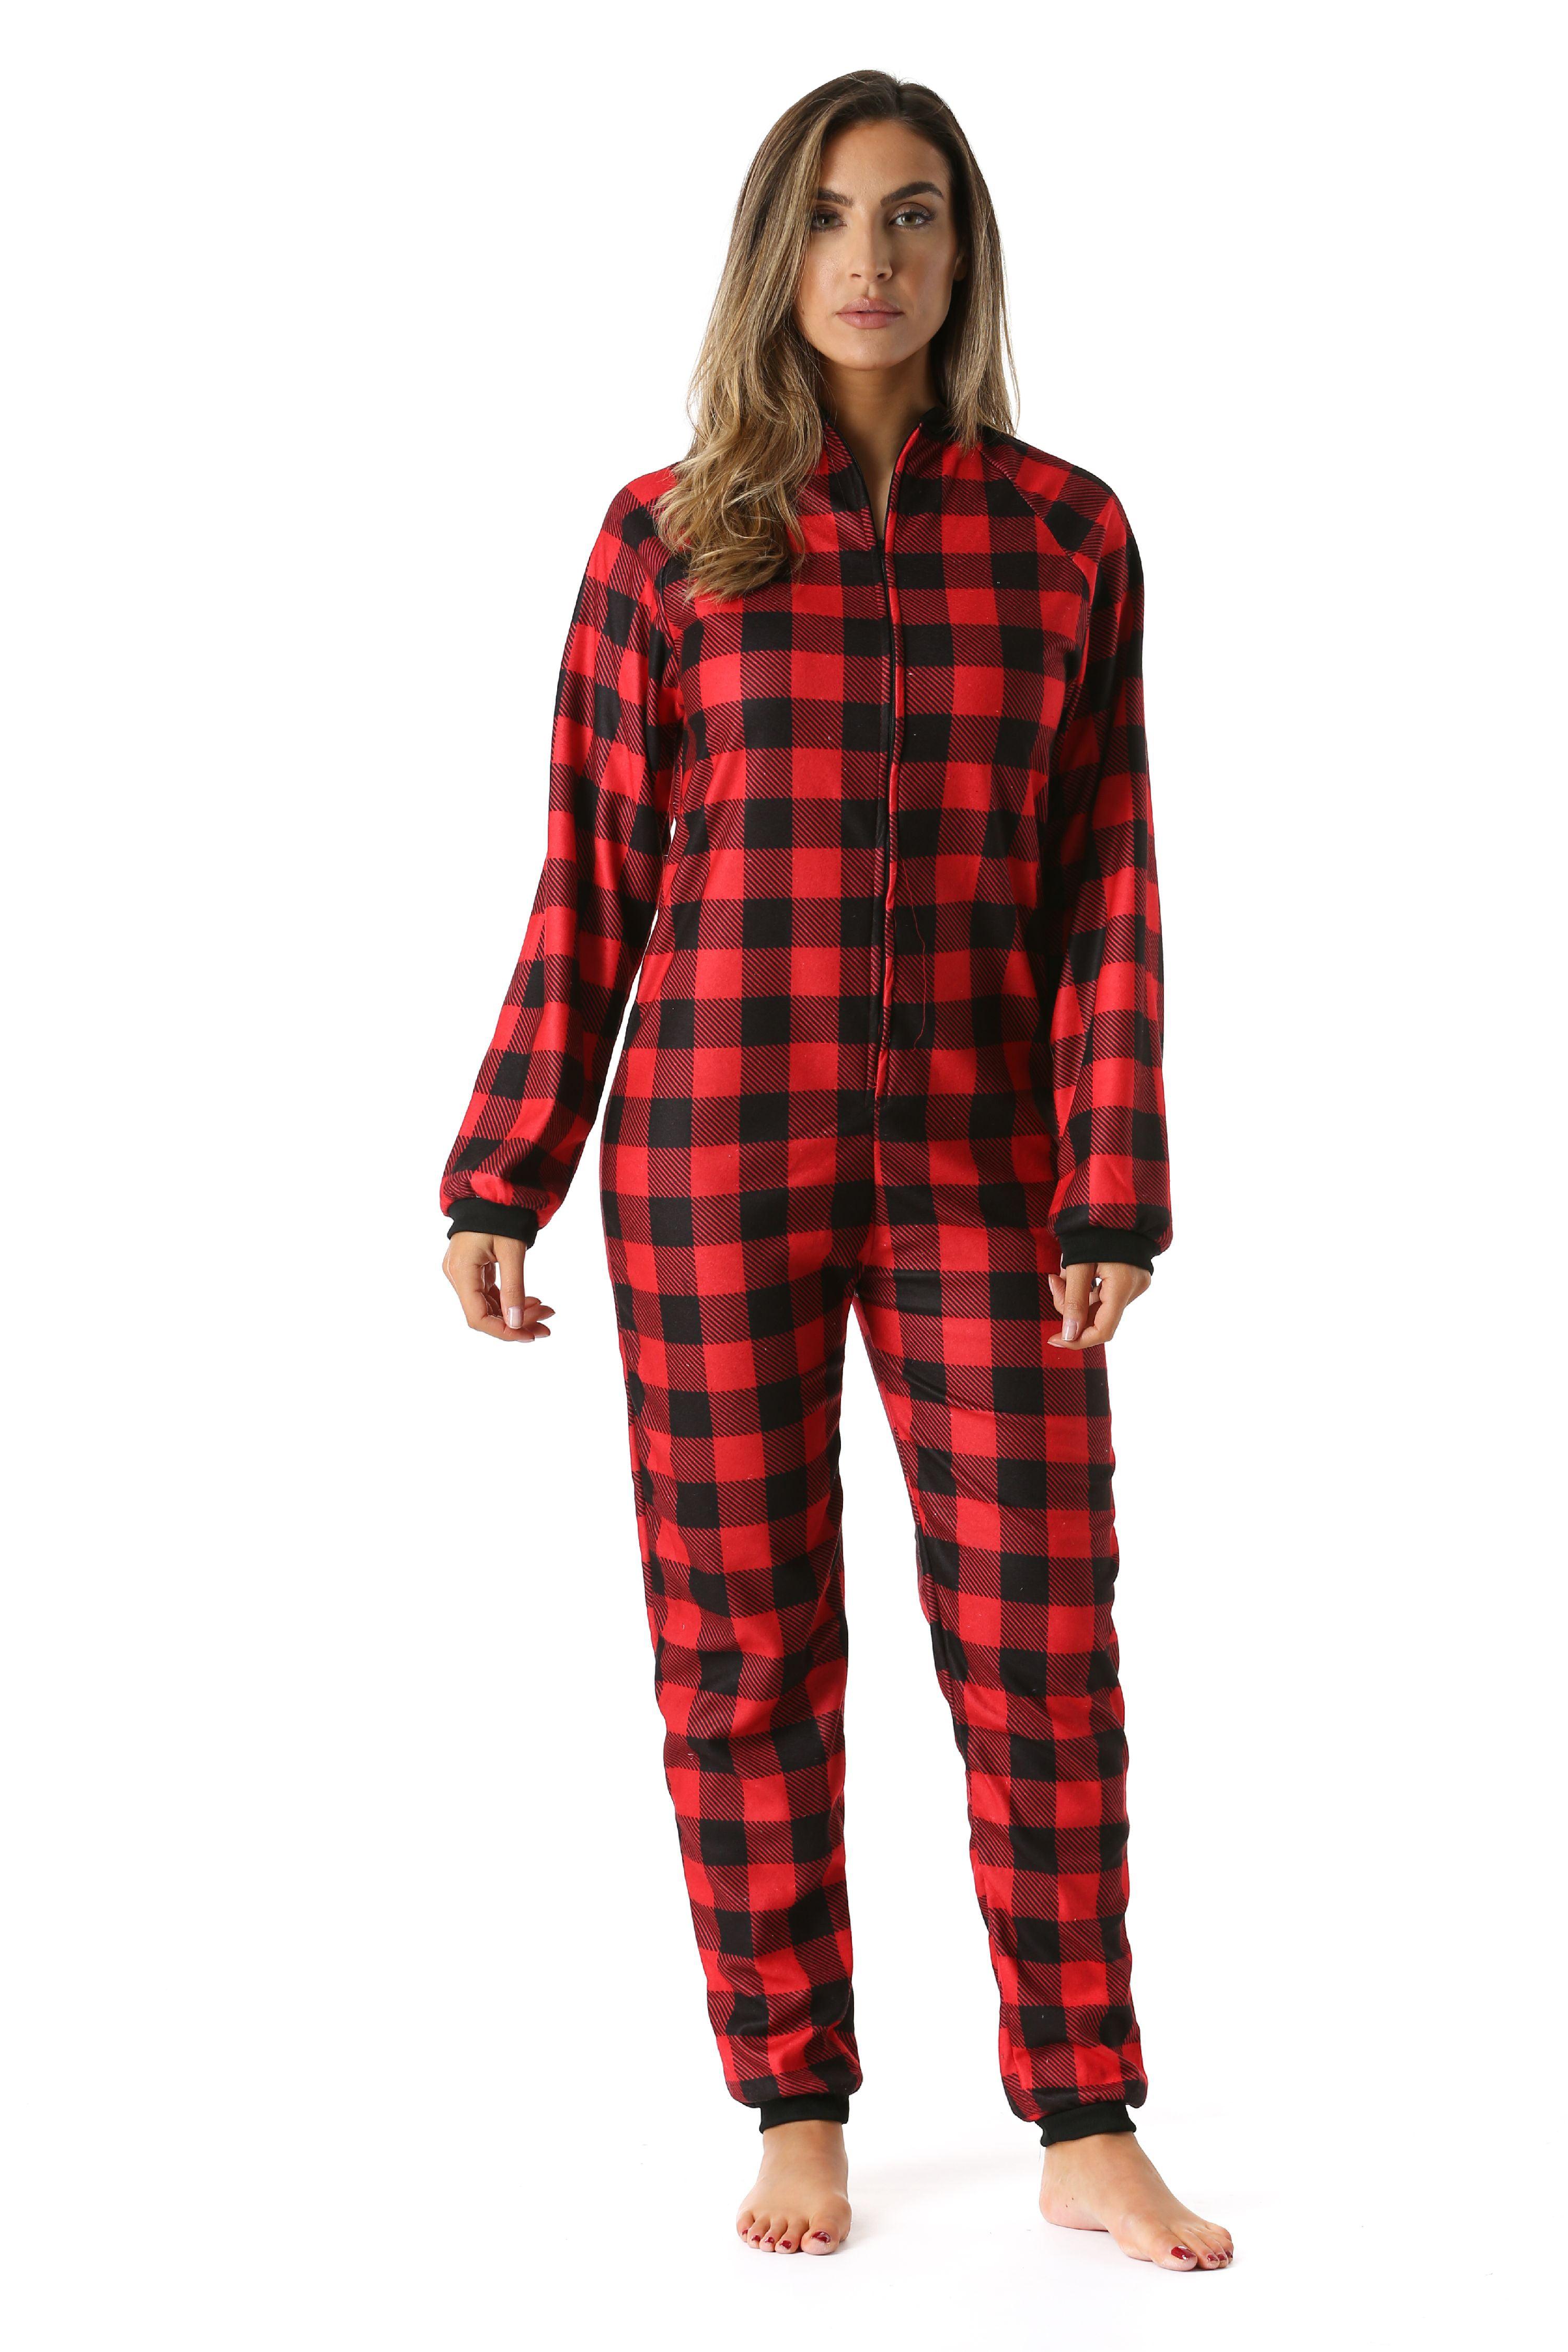 Adult Small Red//Black Adult Gamer Pajama Pants